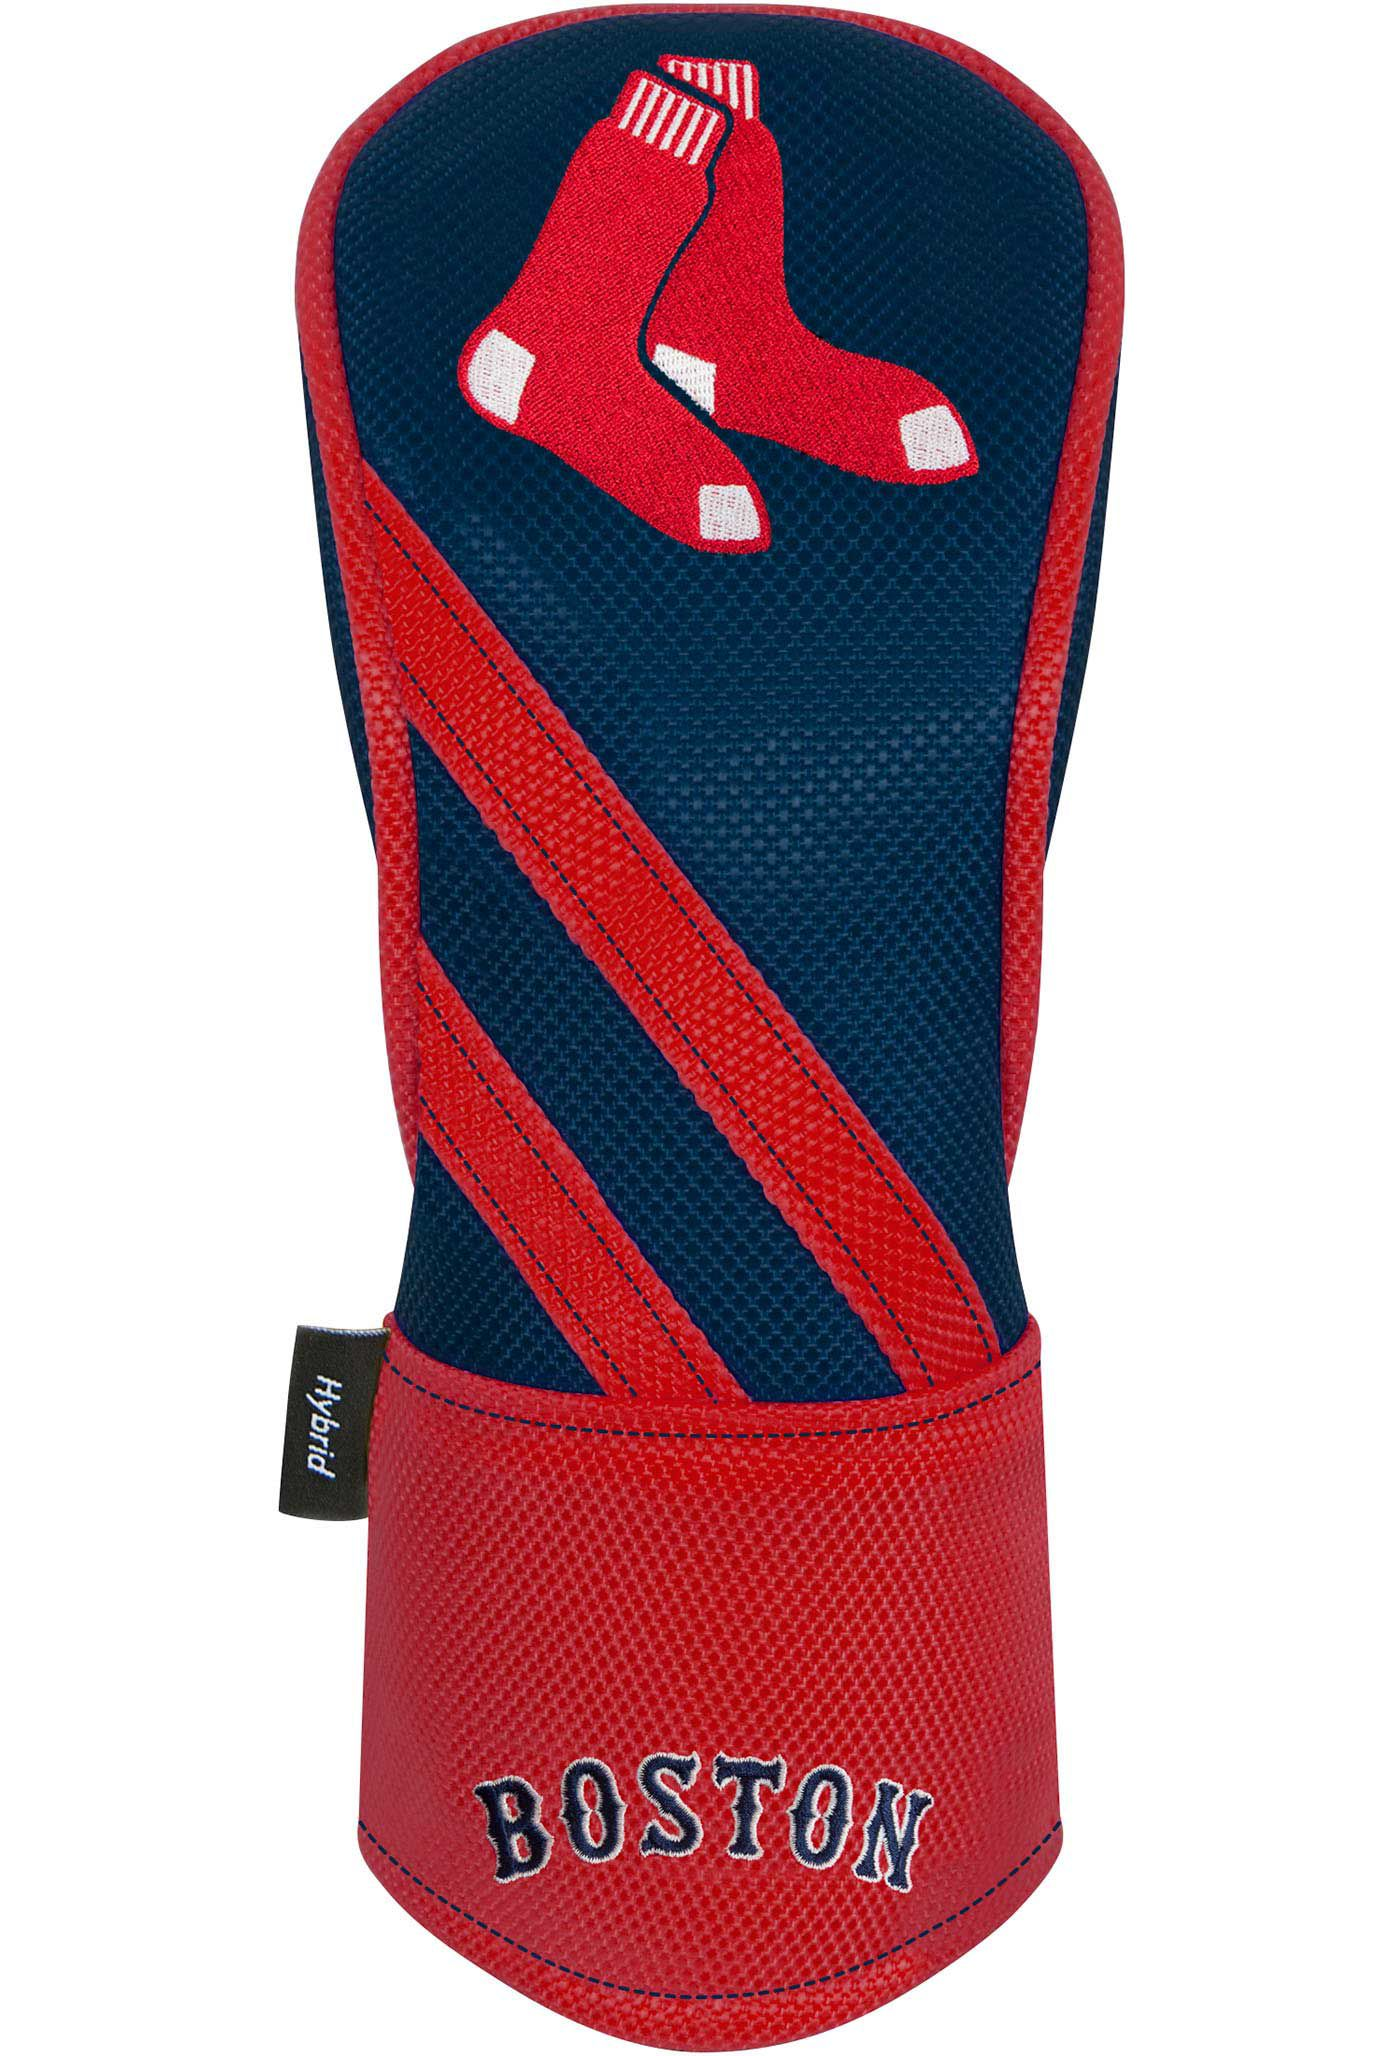 Team Effort Boston Red Sox Hybrid Headcover